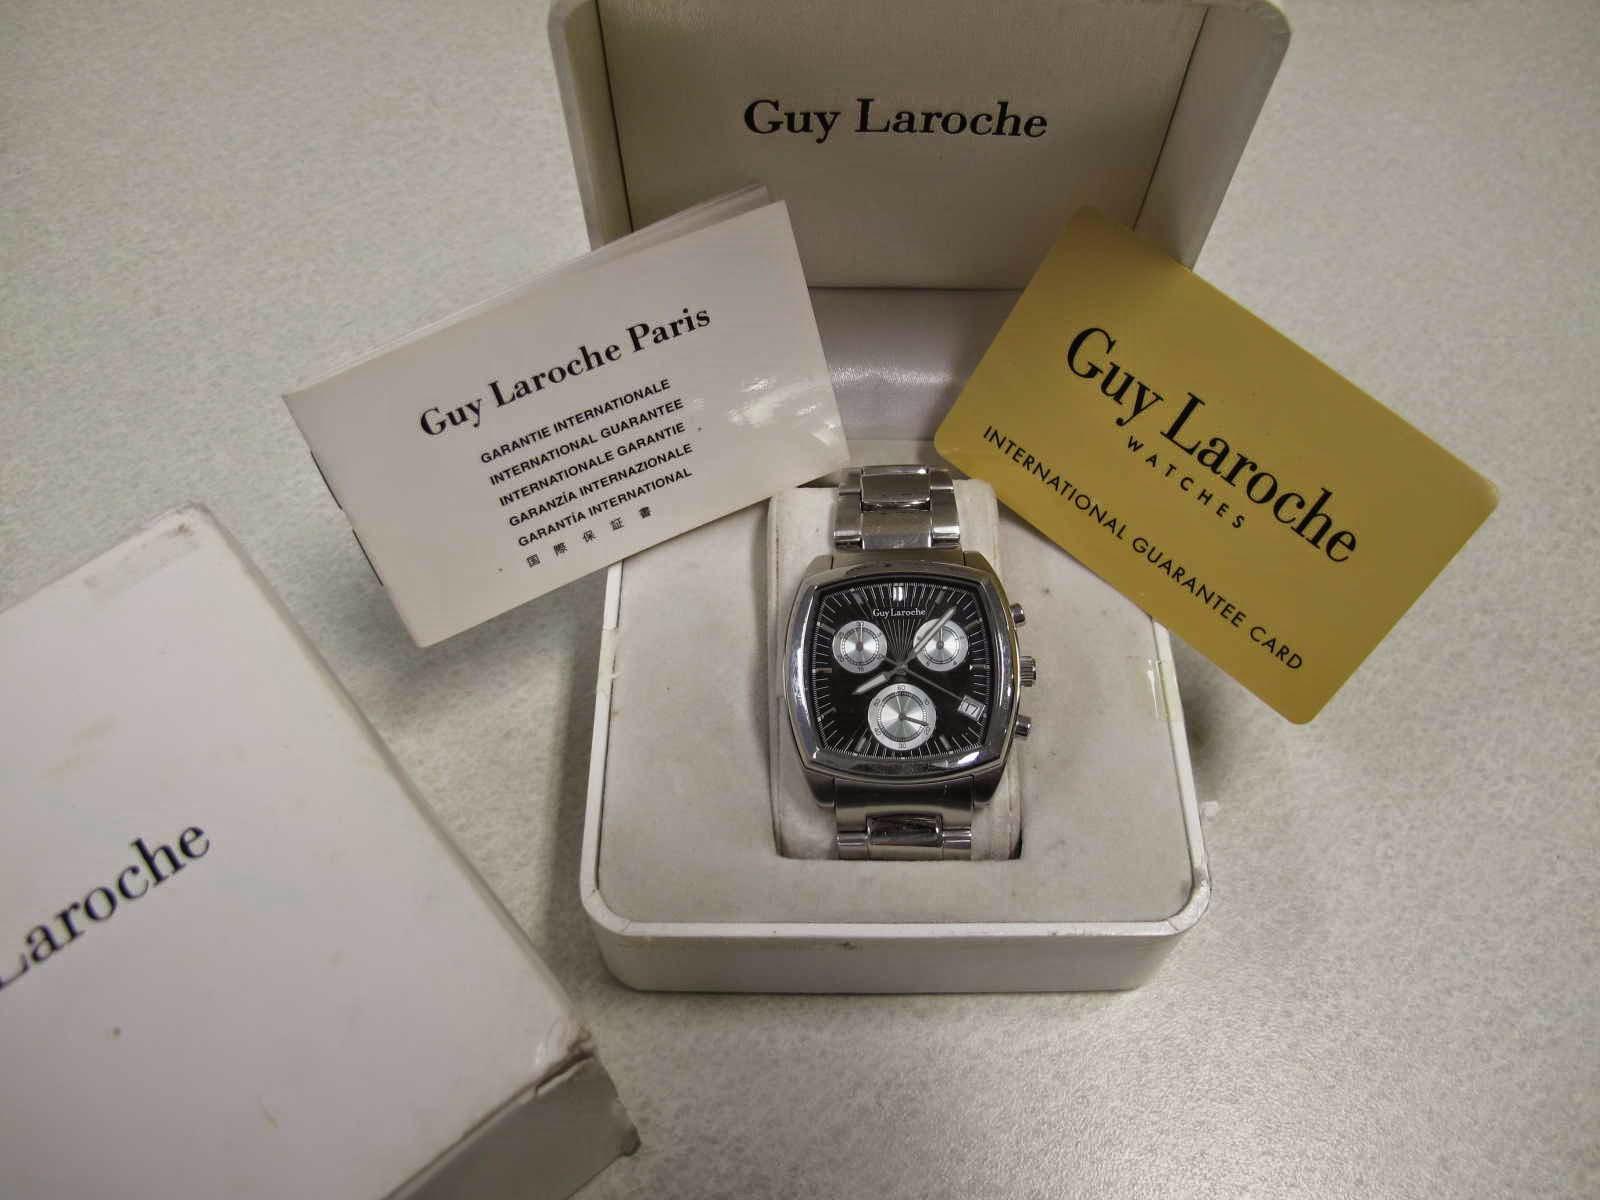 Lengkap dengan box bawaan Guy Laroche manual dan sertifikatnya Cocok untuk Anda yang sedang mencari jam tangan Quartz Chronograph dengan bentuk case